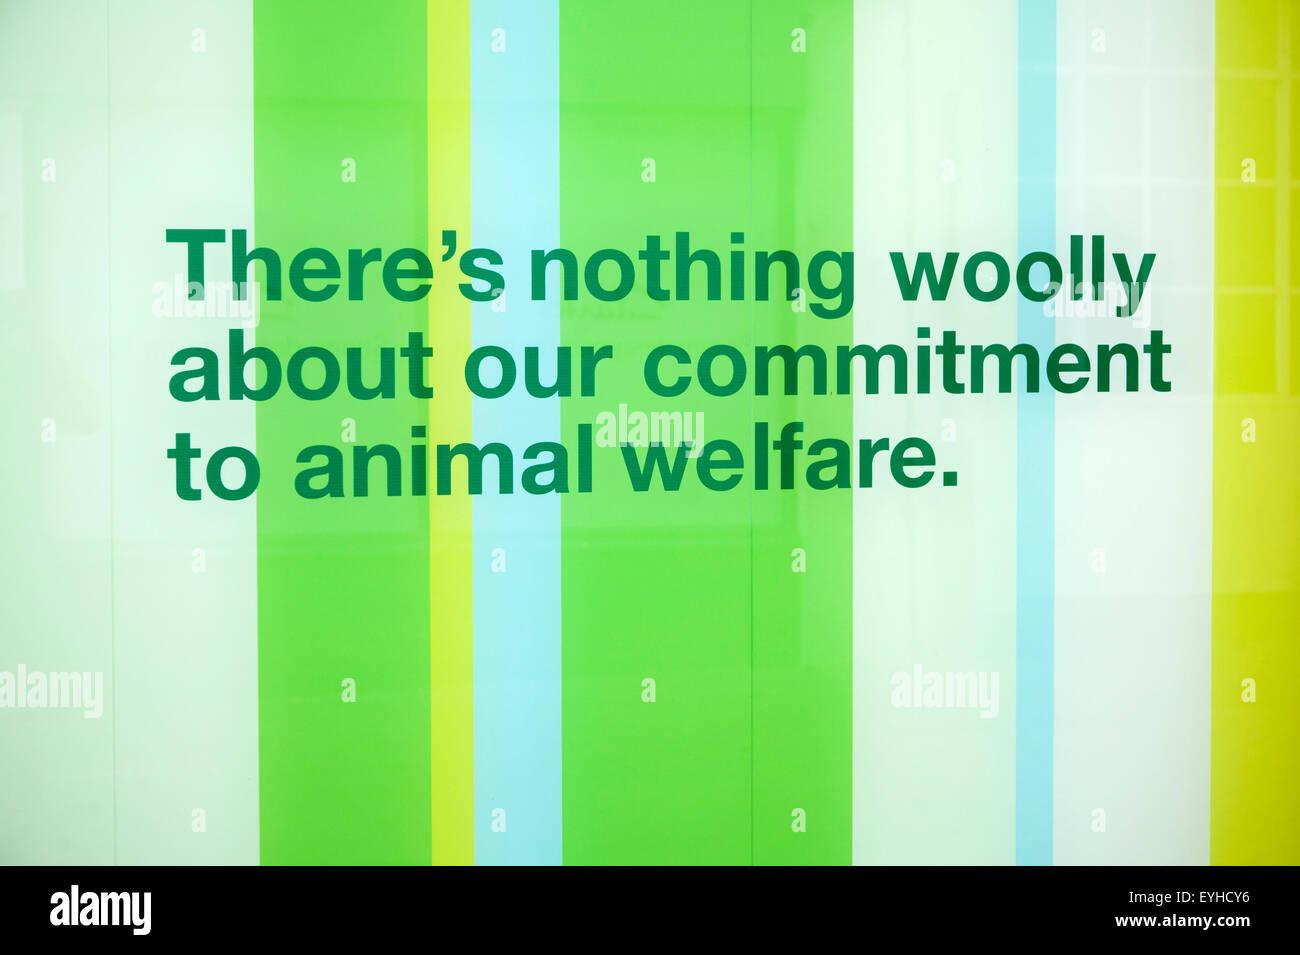 Animal welfare advert, Marks and Spencer shop, UK - Stock Image